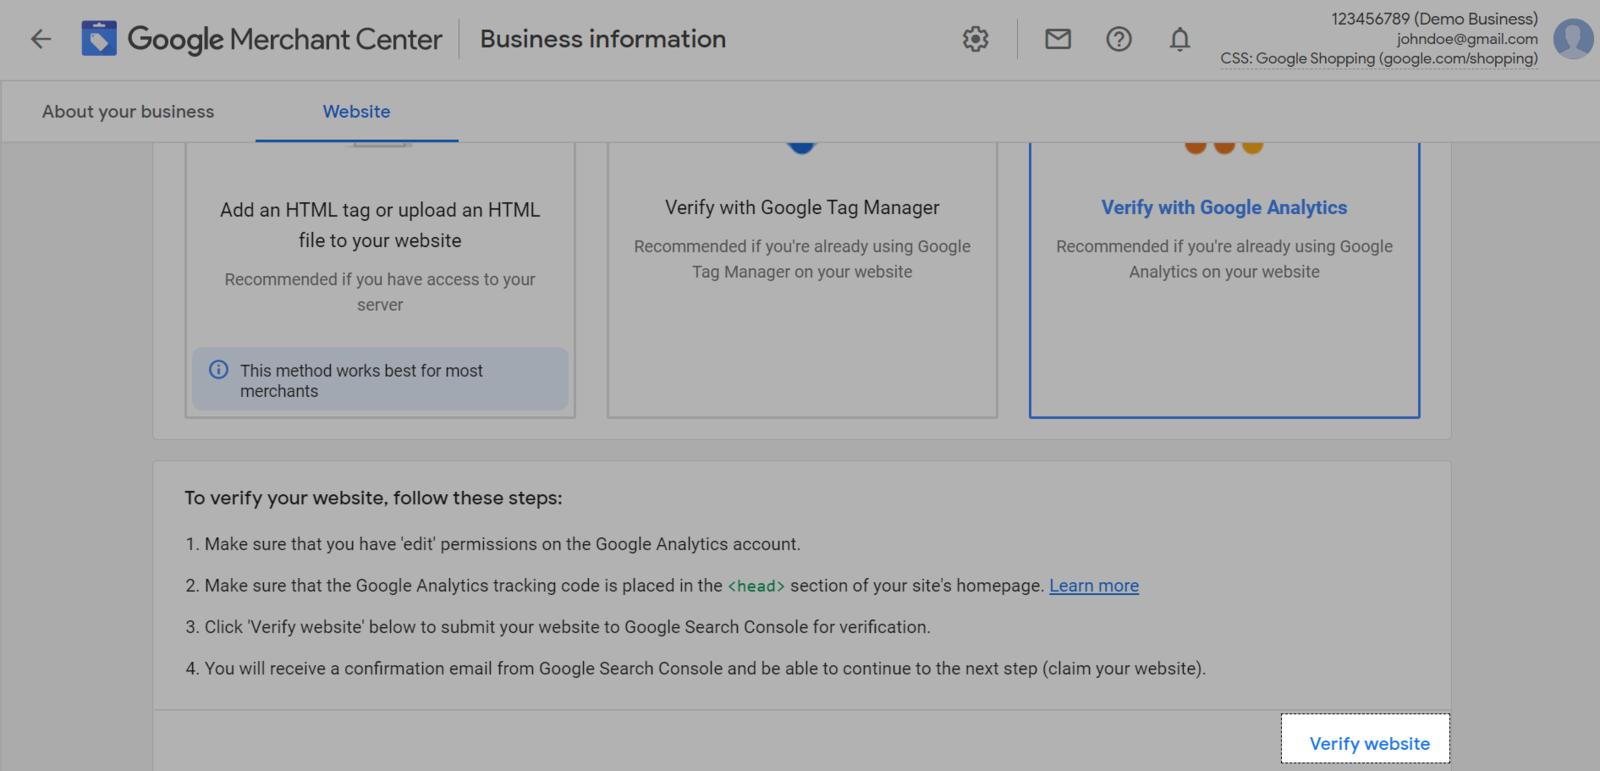 Bấm Verify website để xác nhận